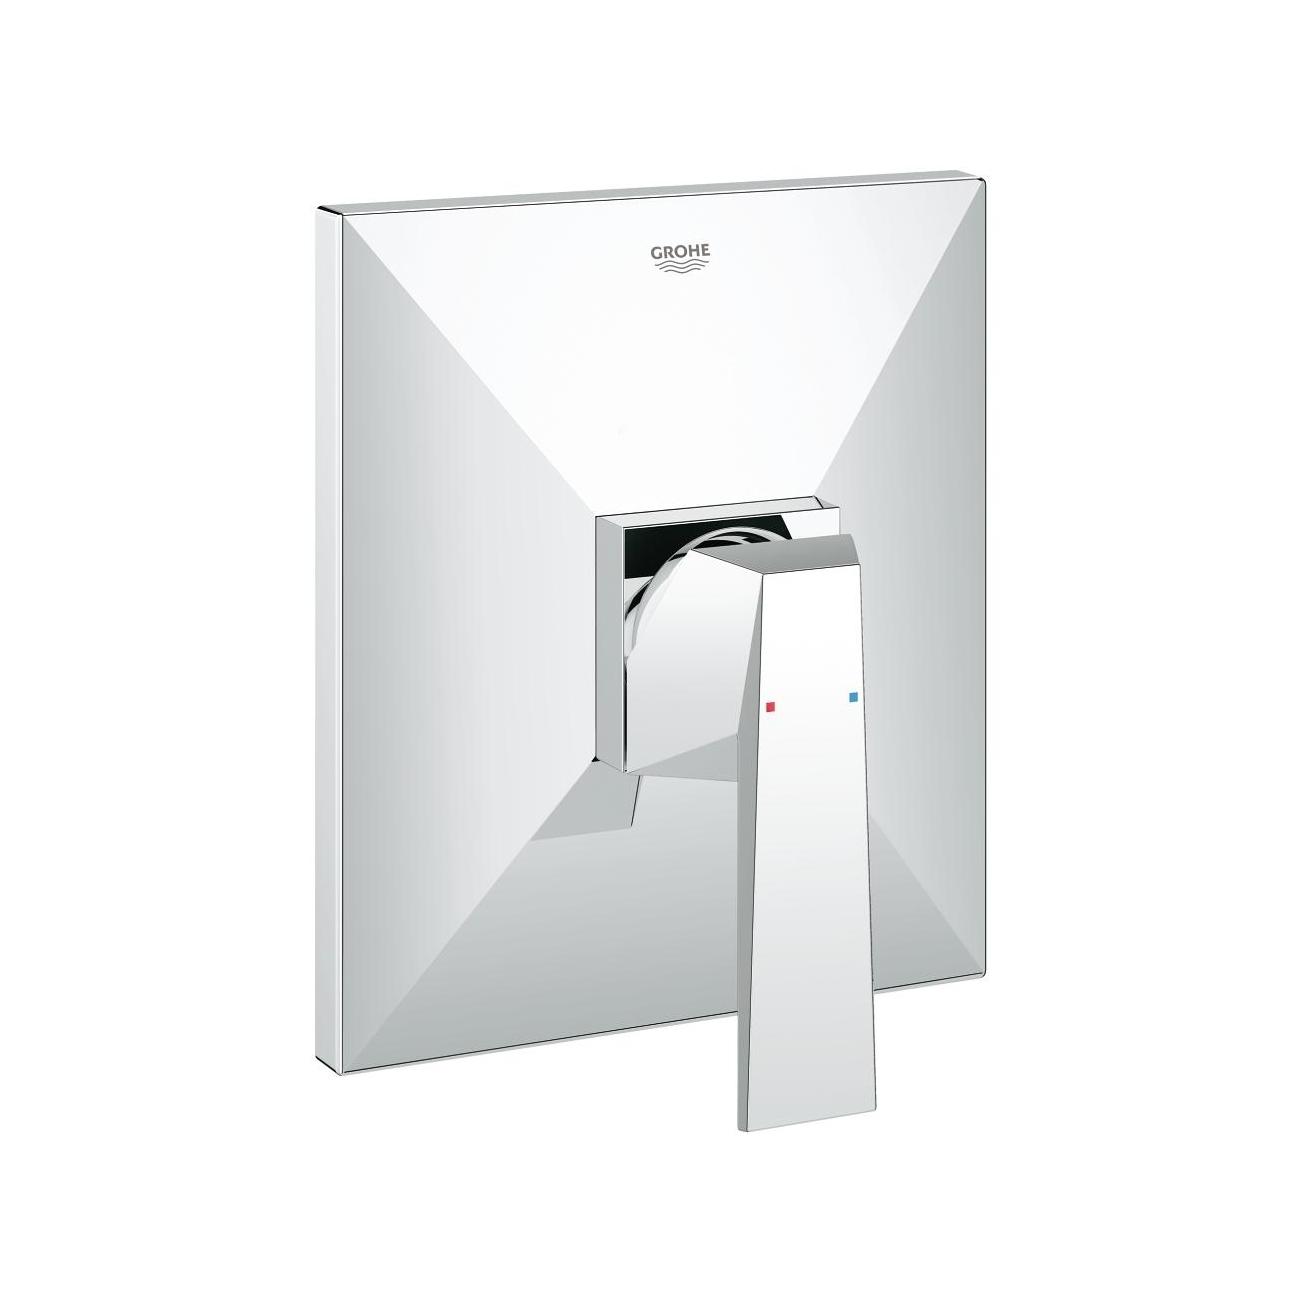 GROHE BRILLIANT Single-lever shower mixer